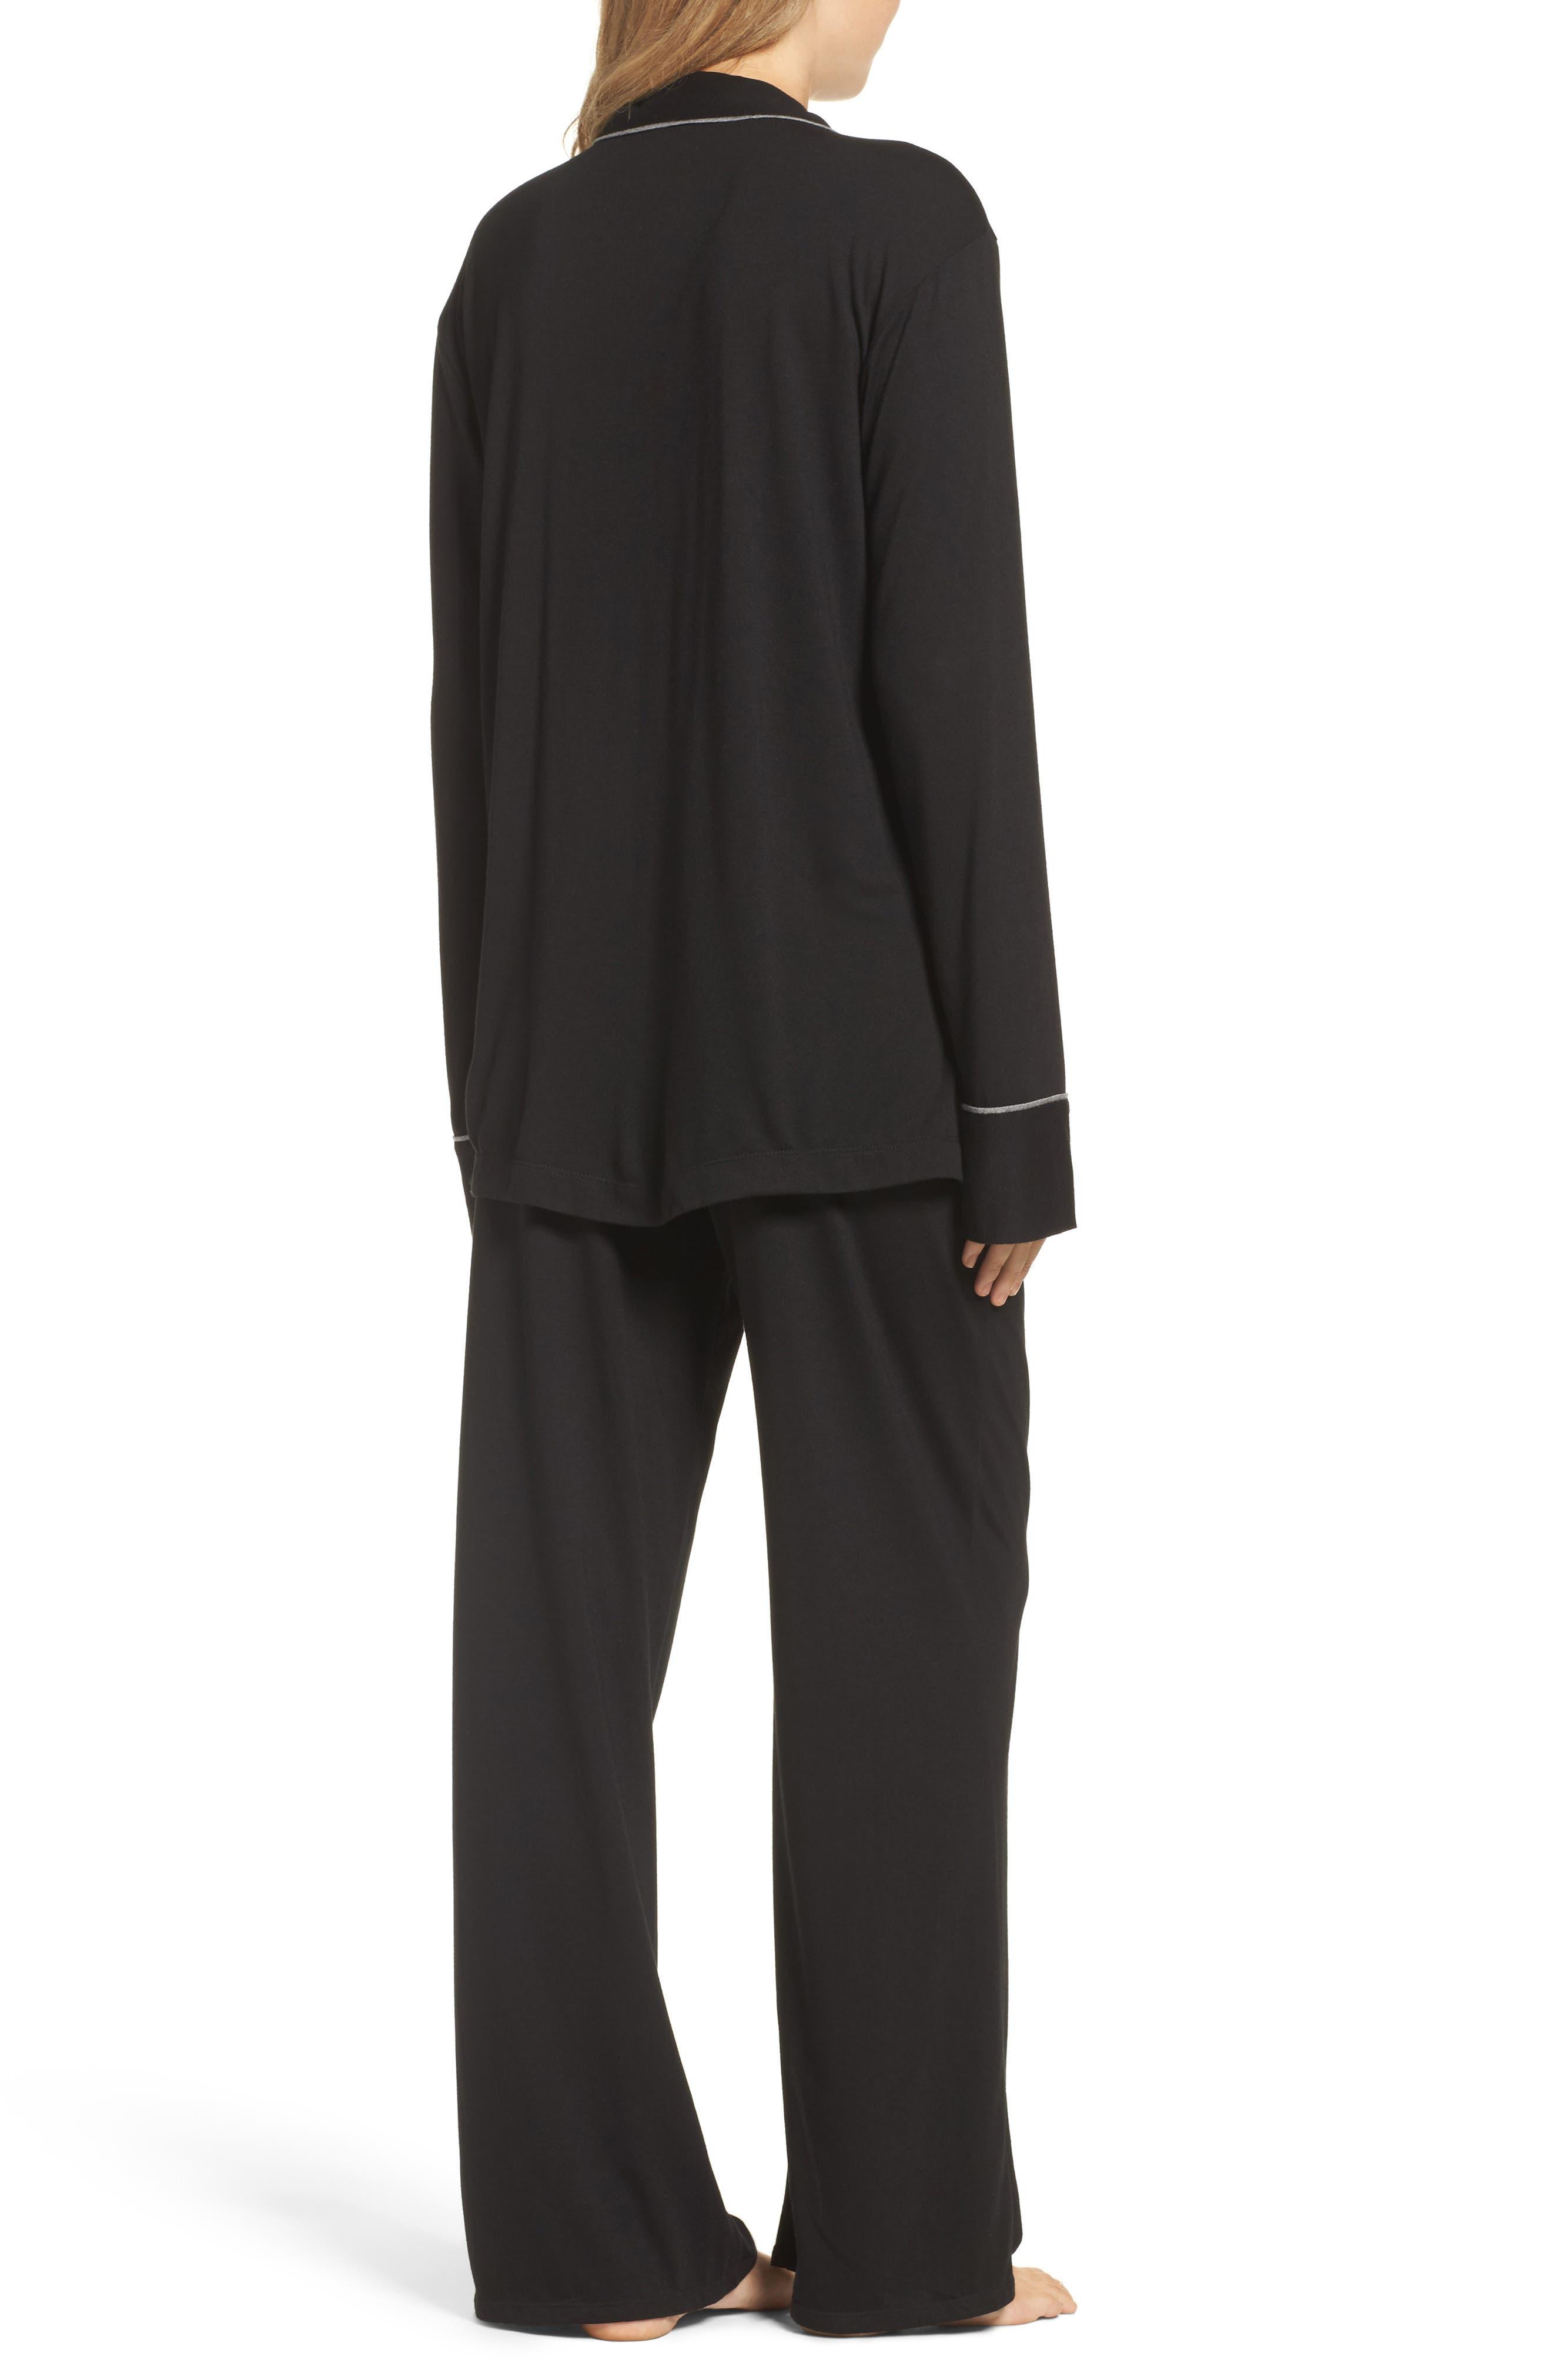 Shangri La Notch Collar Pajamas,                             Alternate thumbnail 2, color,                             001